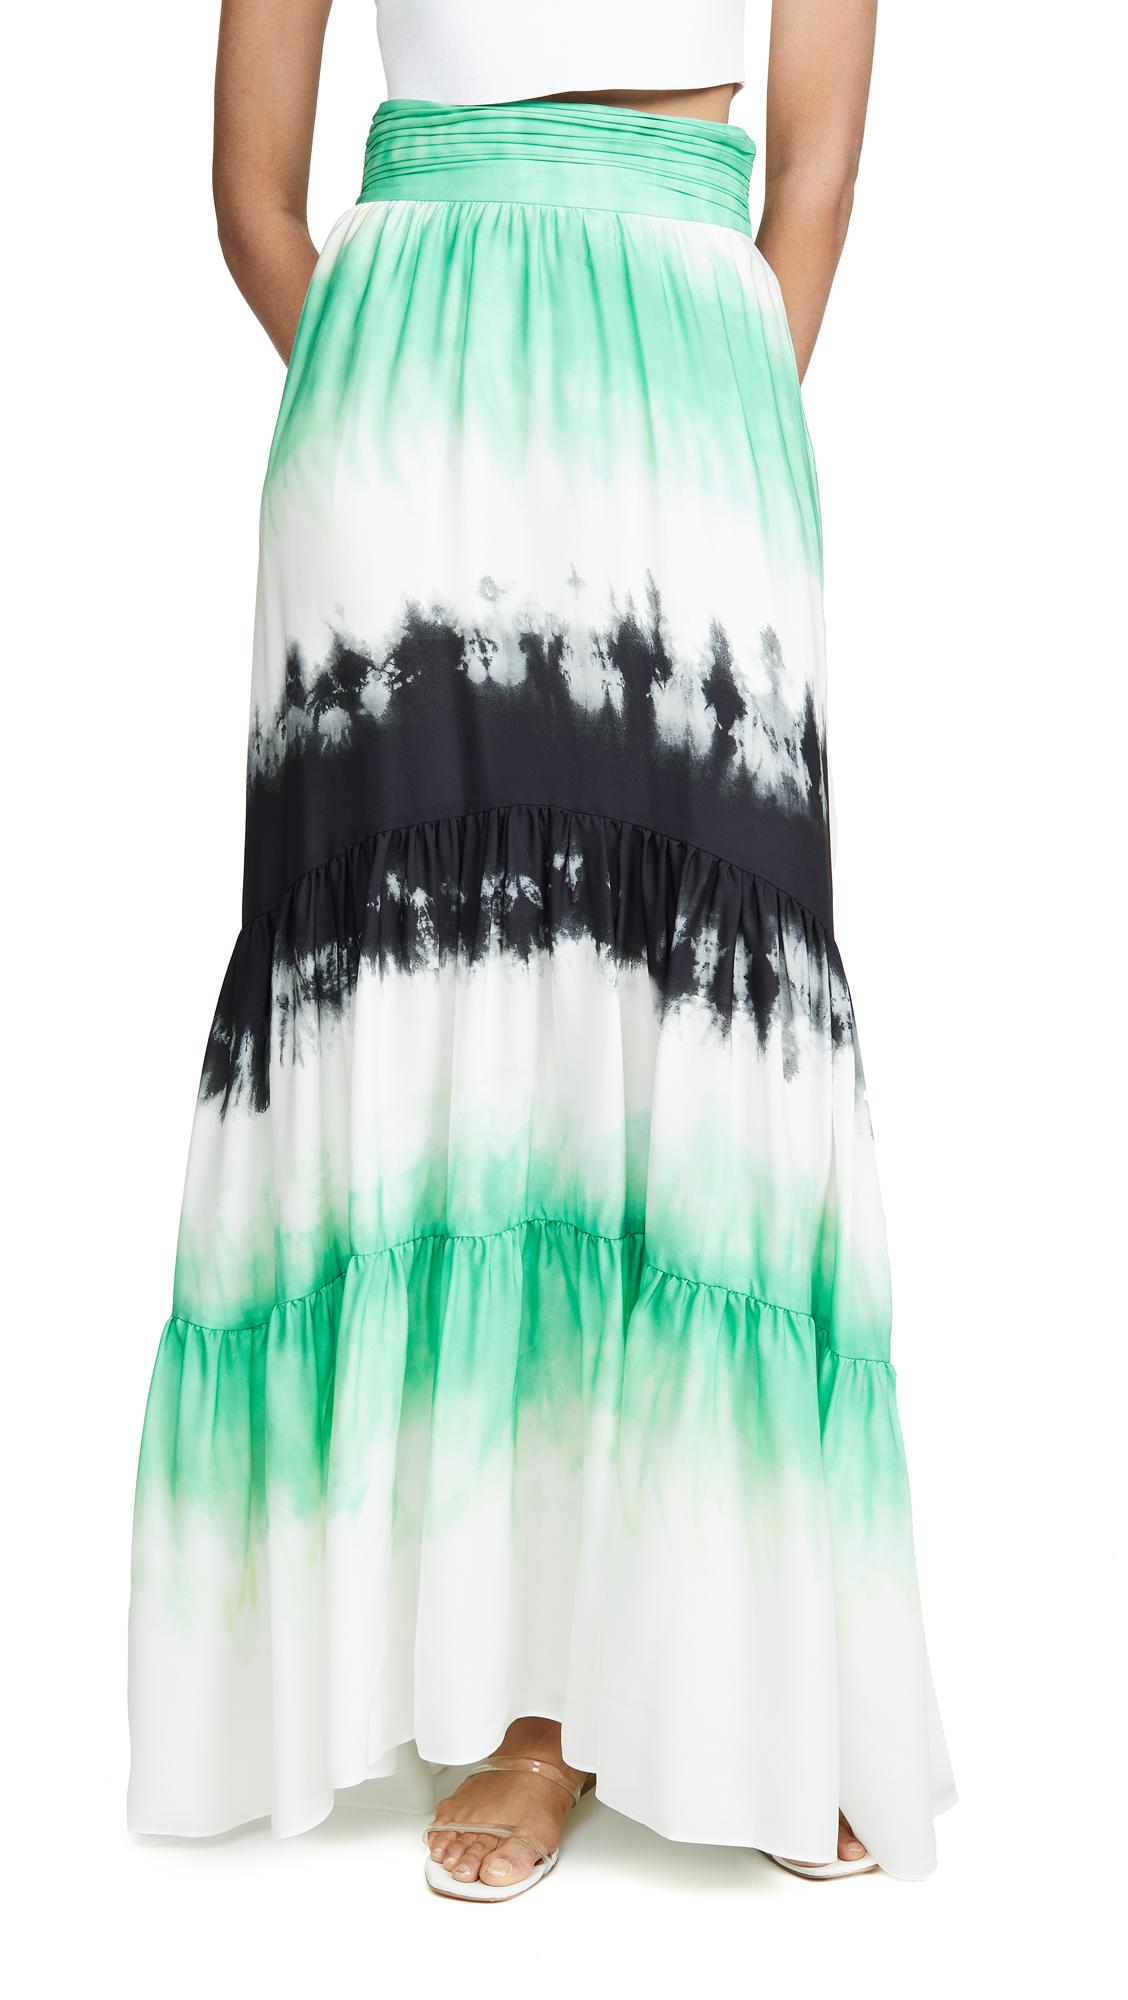 A.L.C. Hopkins Skirt - Green/Black